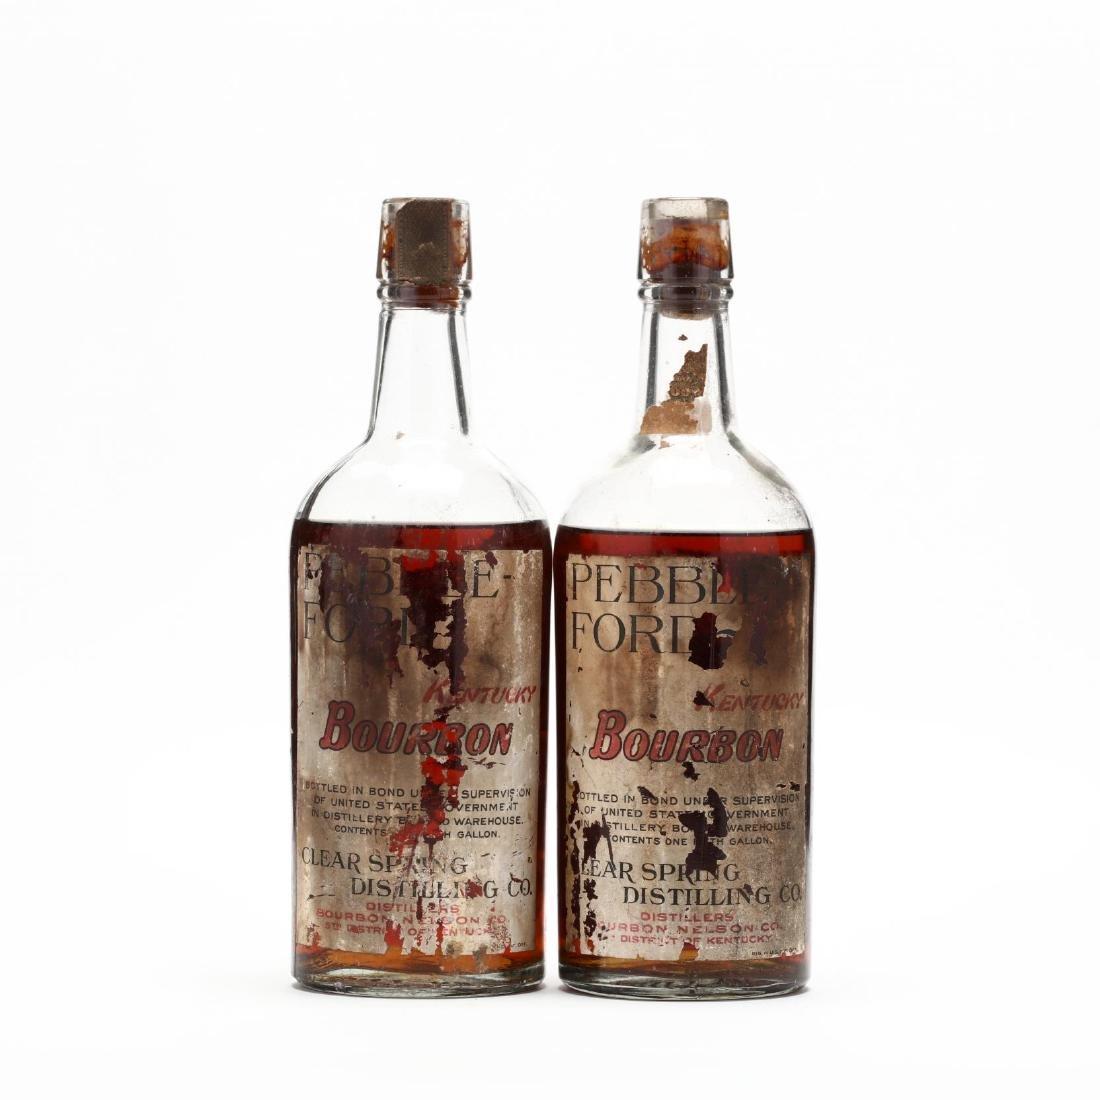 Pebbleford Kentucky Bourbon